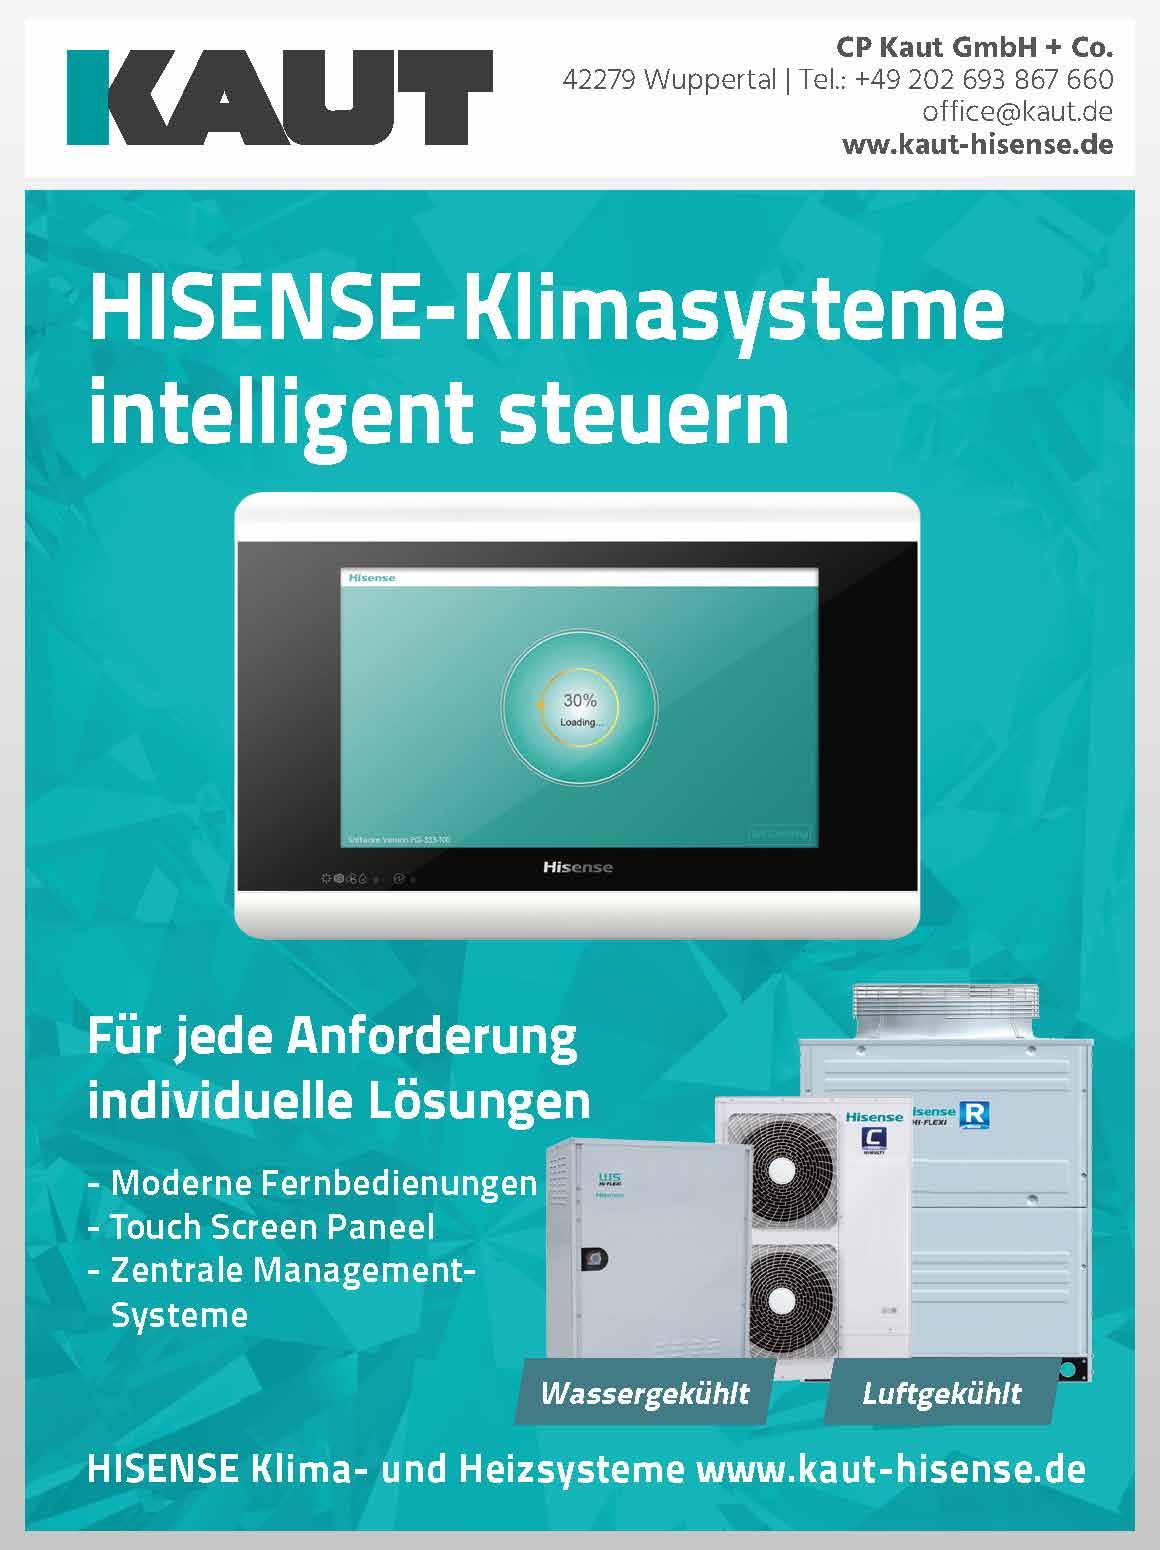 Hans Kaut GmbH + Co.